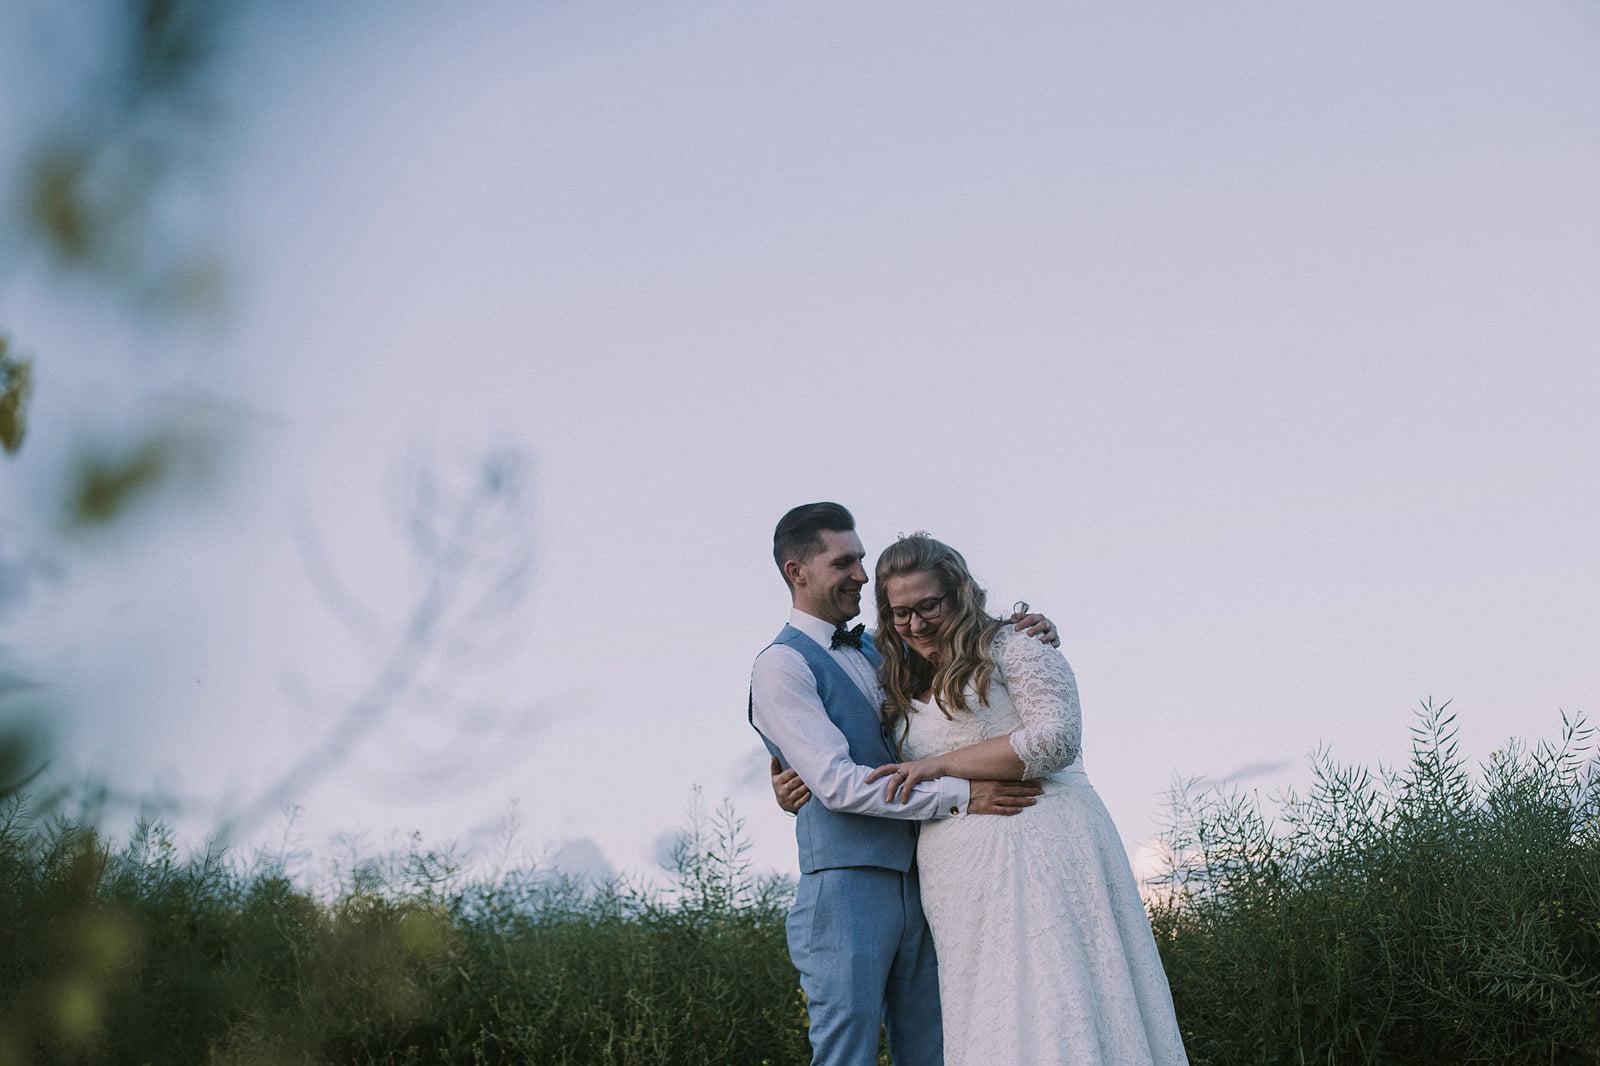 wedding photographer swallows nest barn